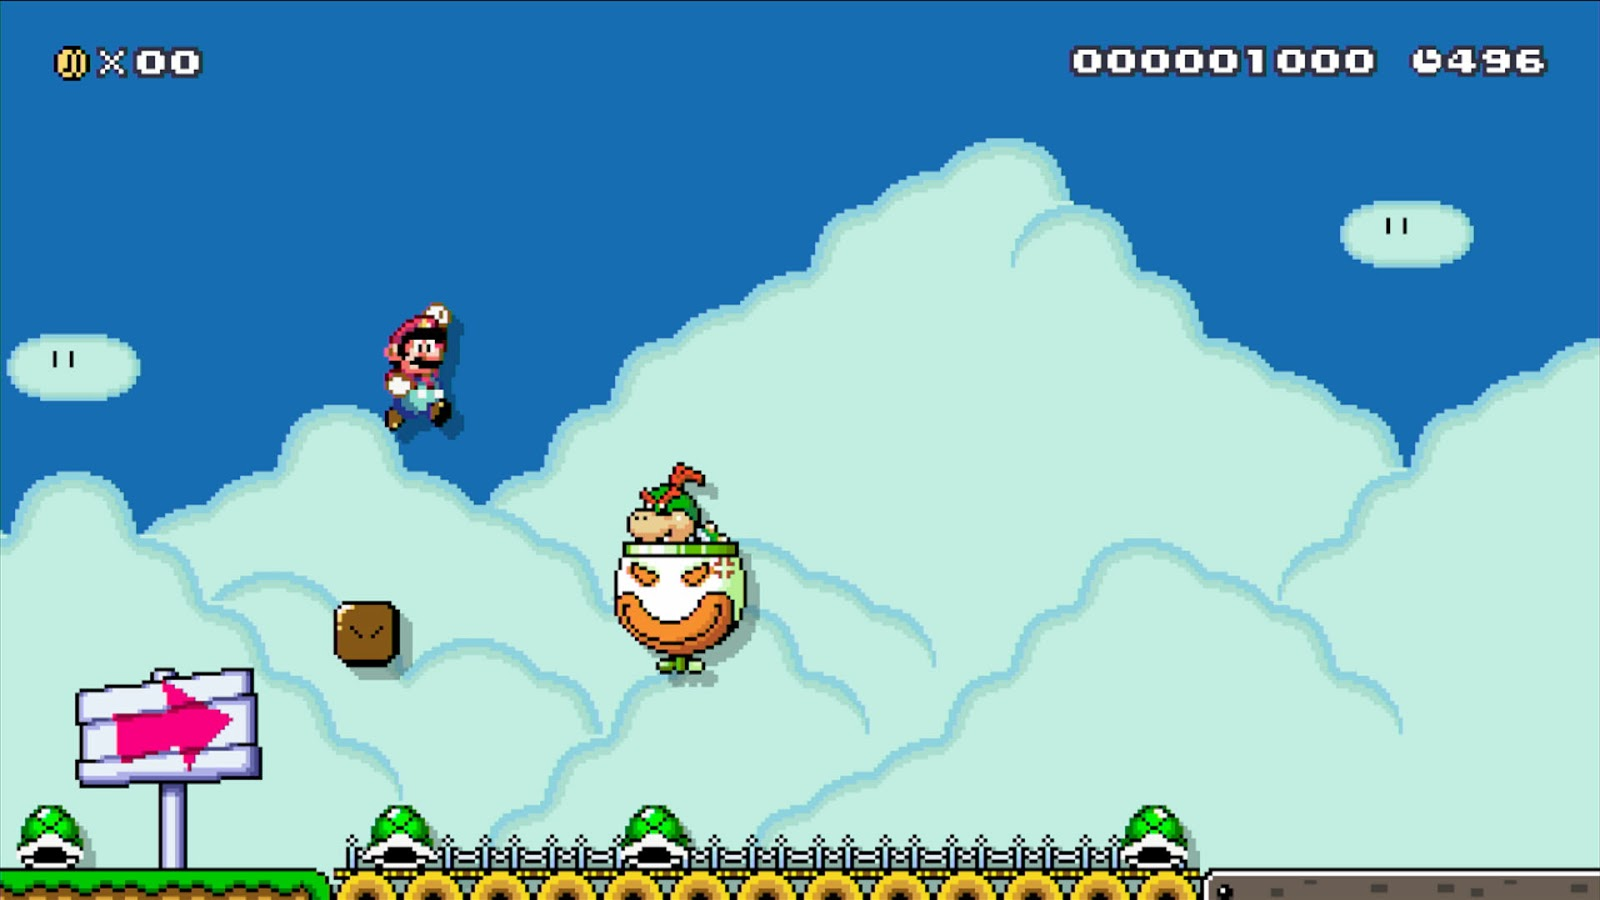 Chalgyr's Game Room: Super Mario Maker - Wii U Review